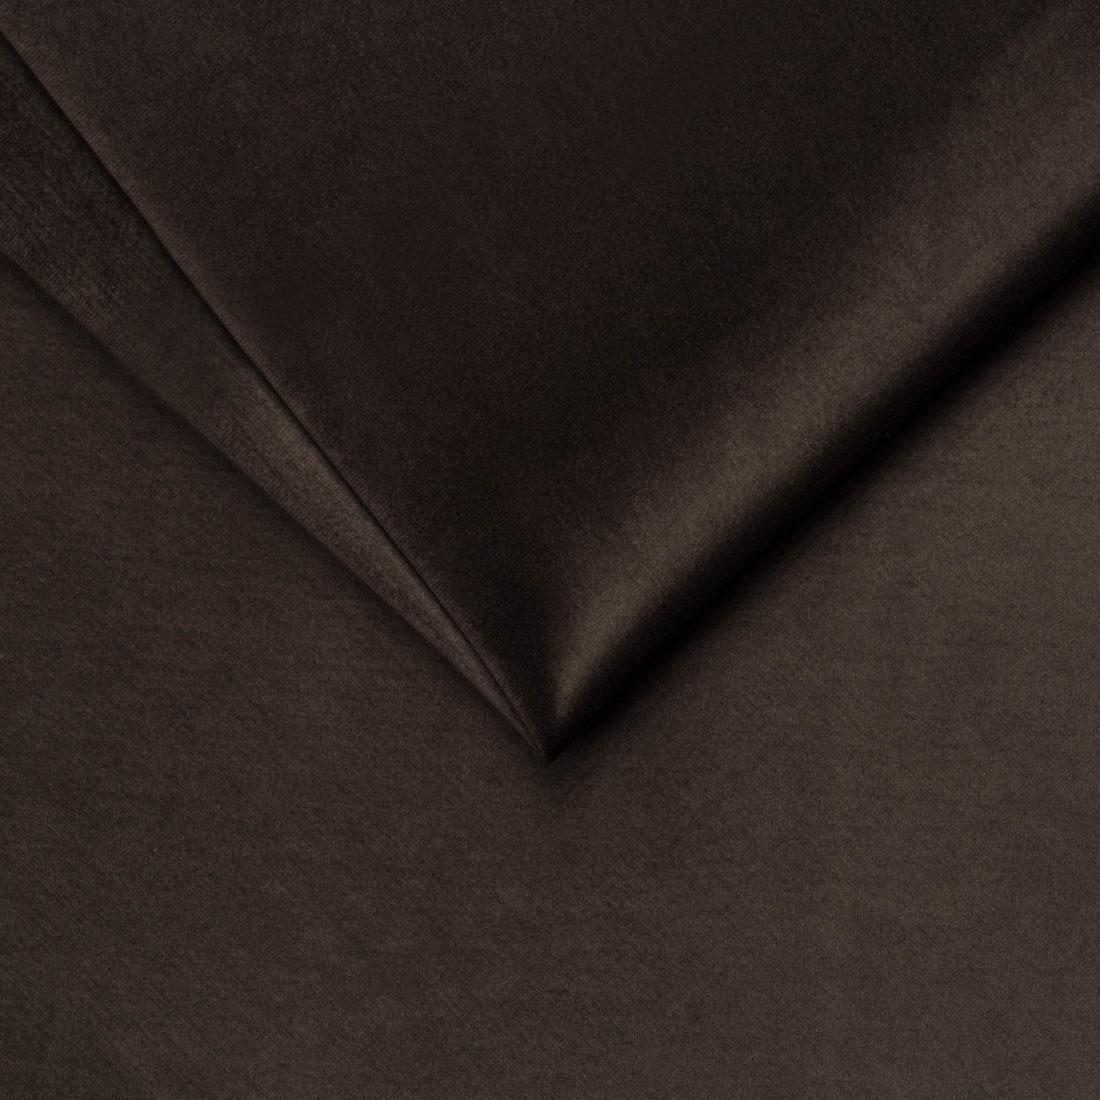 Мебельная ткань Velluto 6 Espresso, велюр